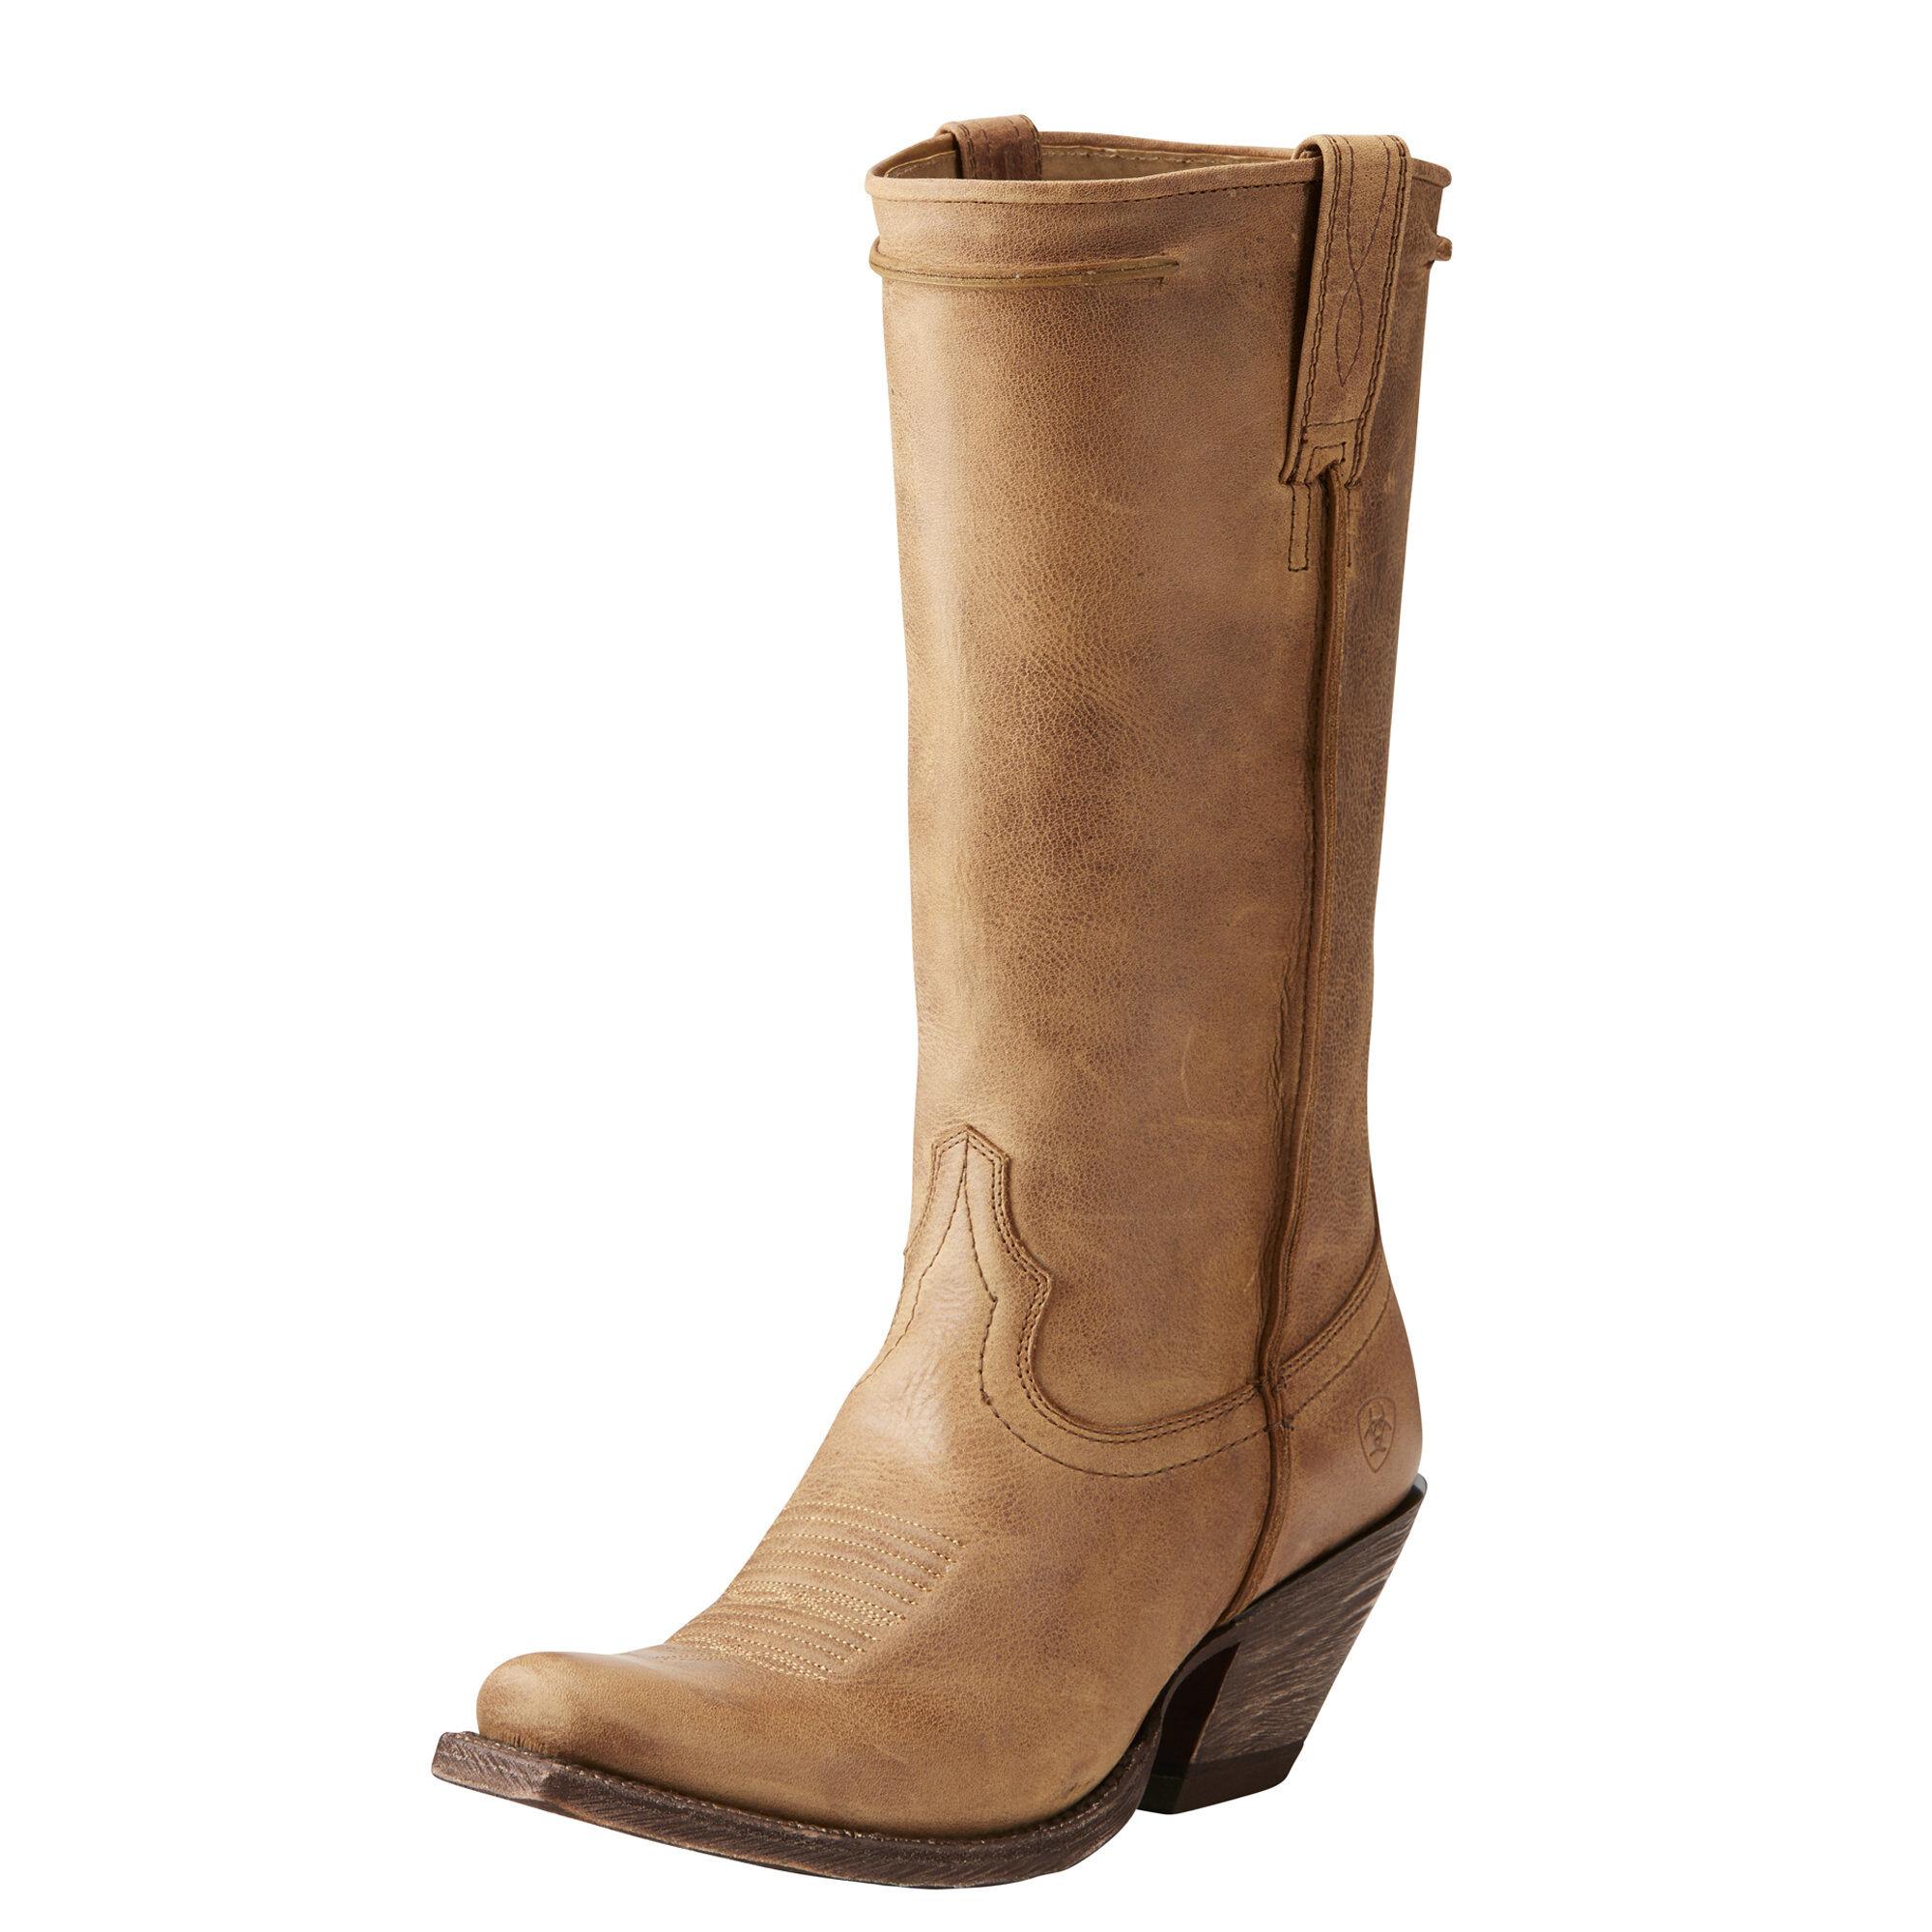 Ariat Rowan Riding Boot (Women's) vNSWv